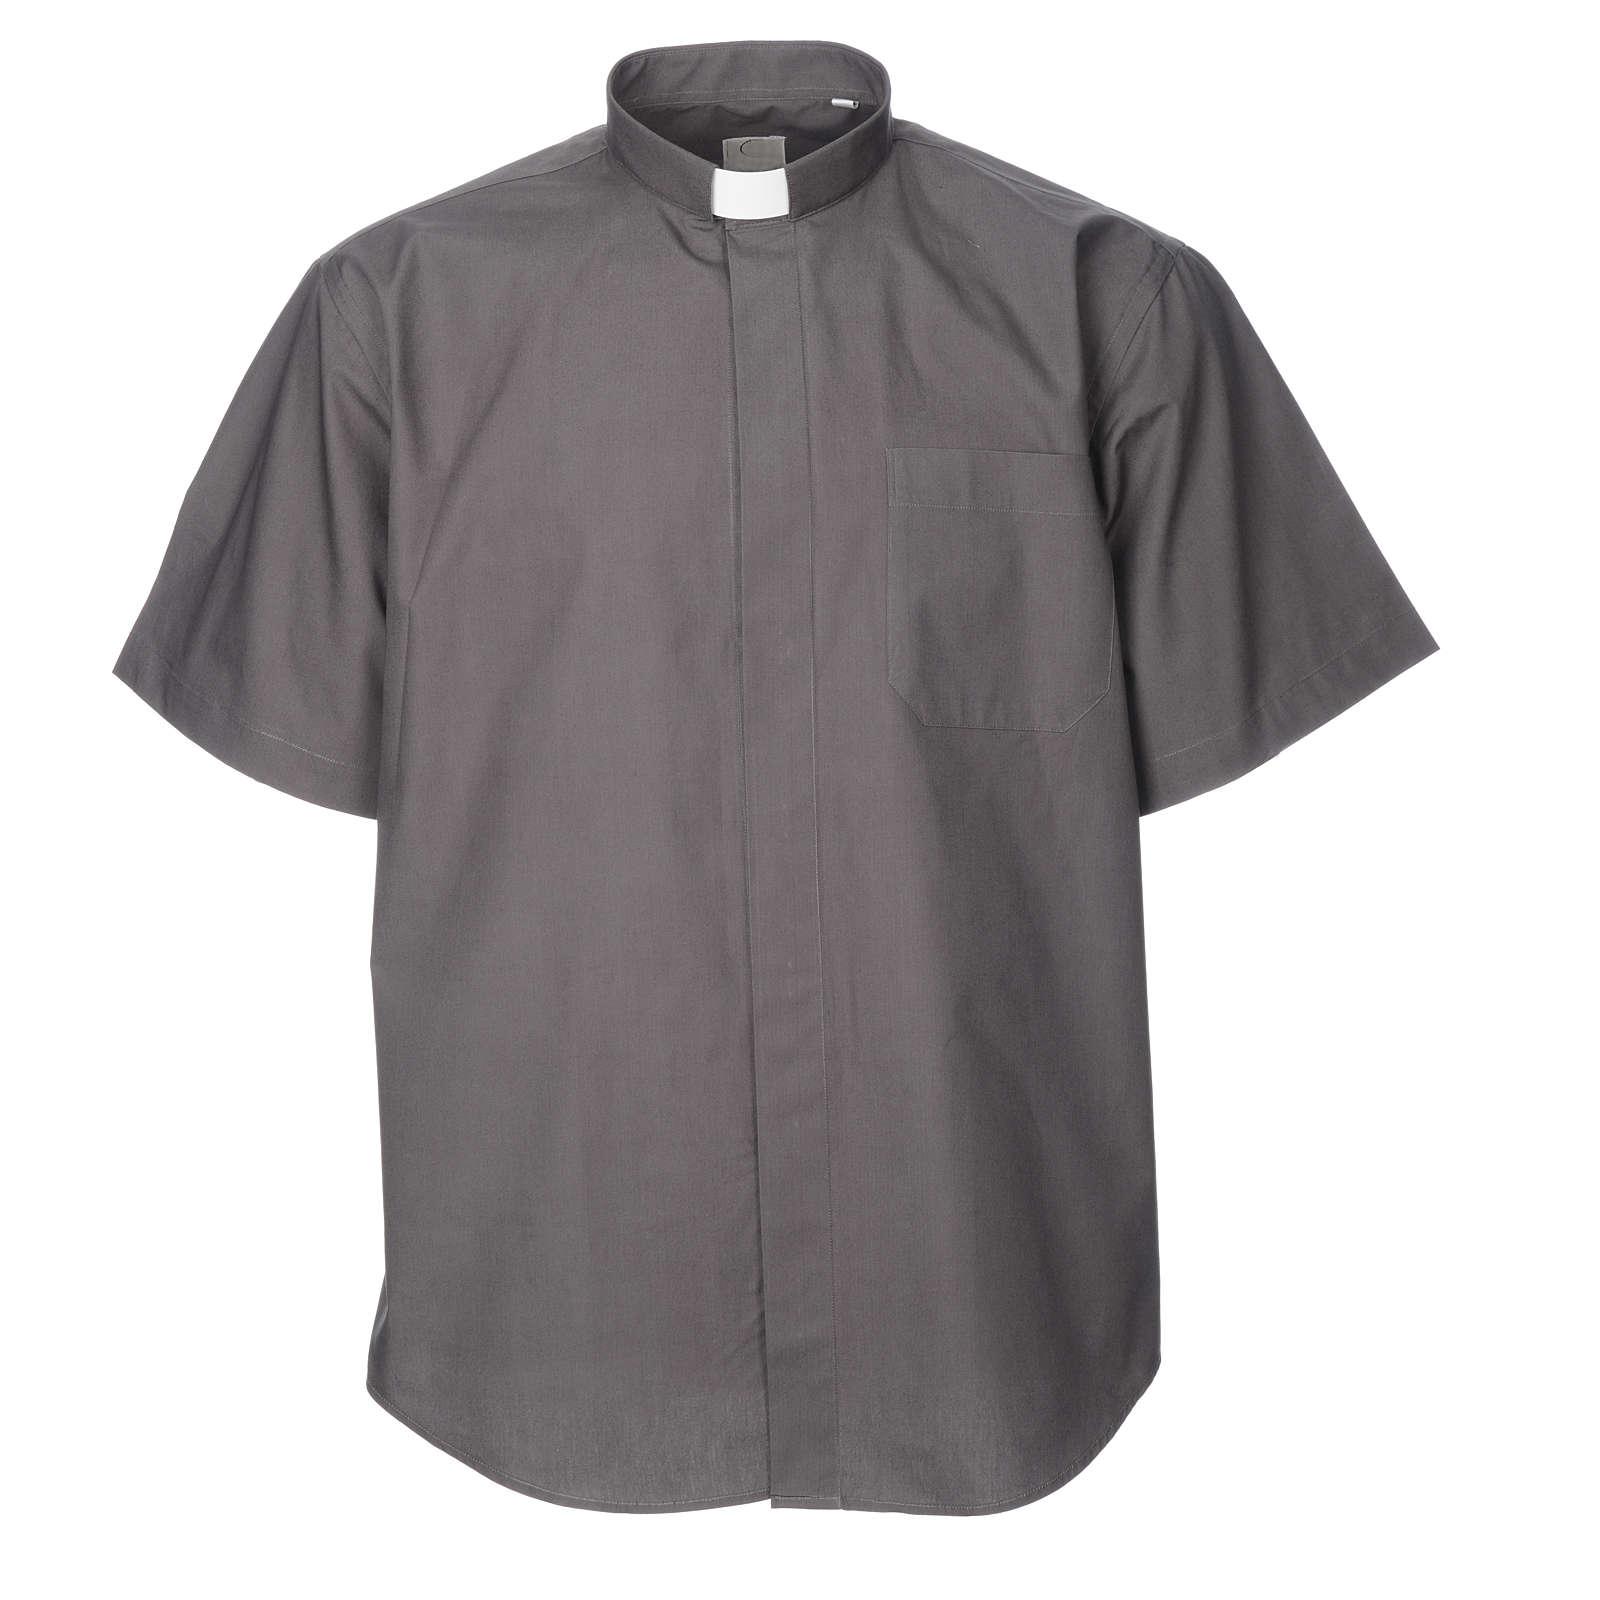 STOCK Camisa clergyman m/c popeline cinzento escuro 4